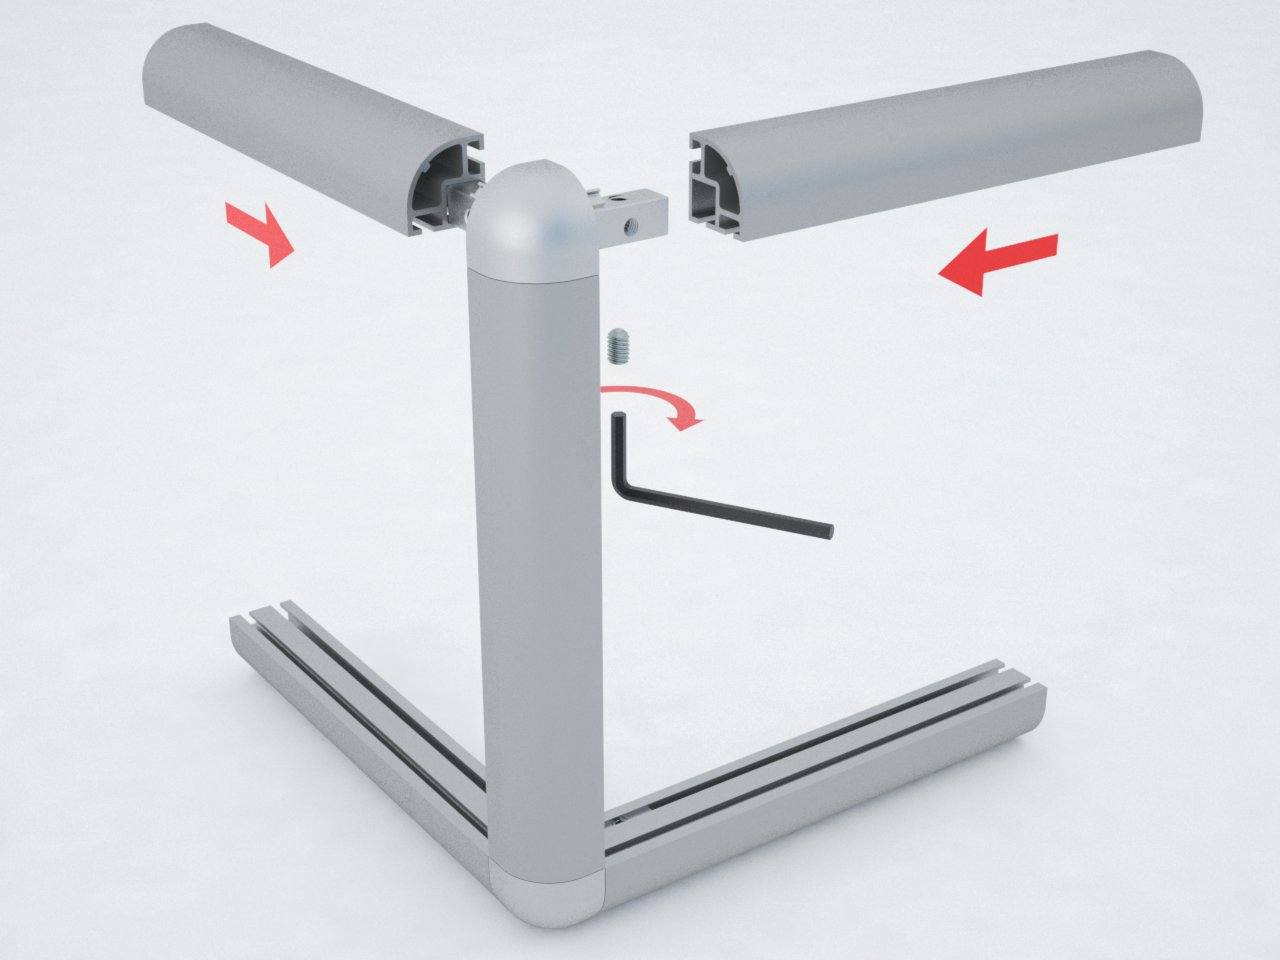 C550 perfil de alum nio abaulado pedrosa sistema de for Perfiles de aluminio para toldos de palilleria